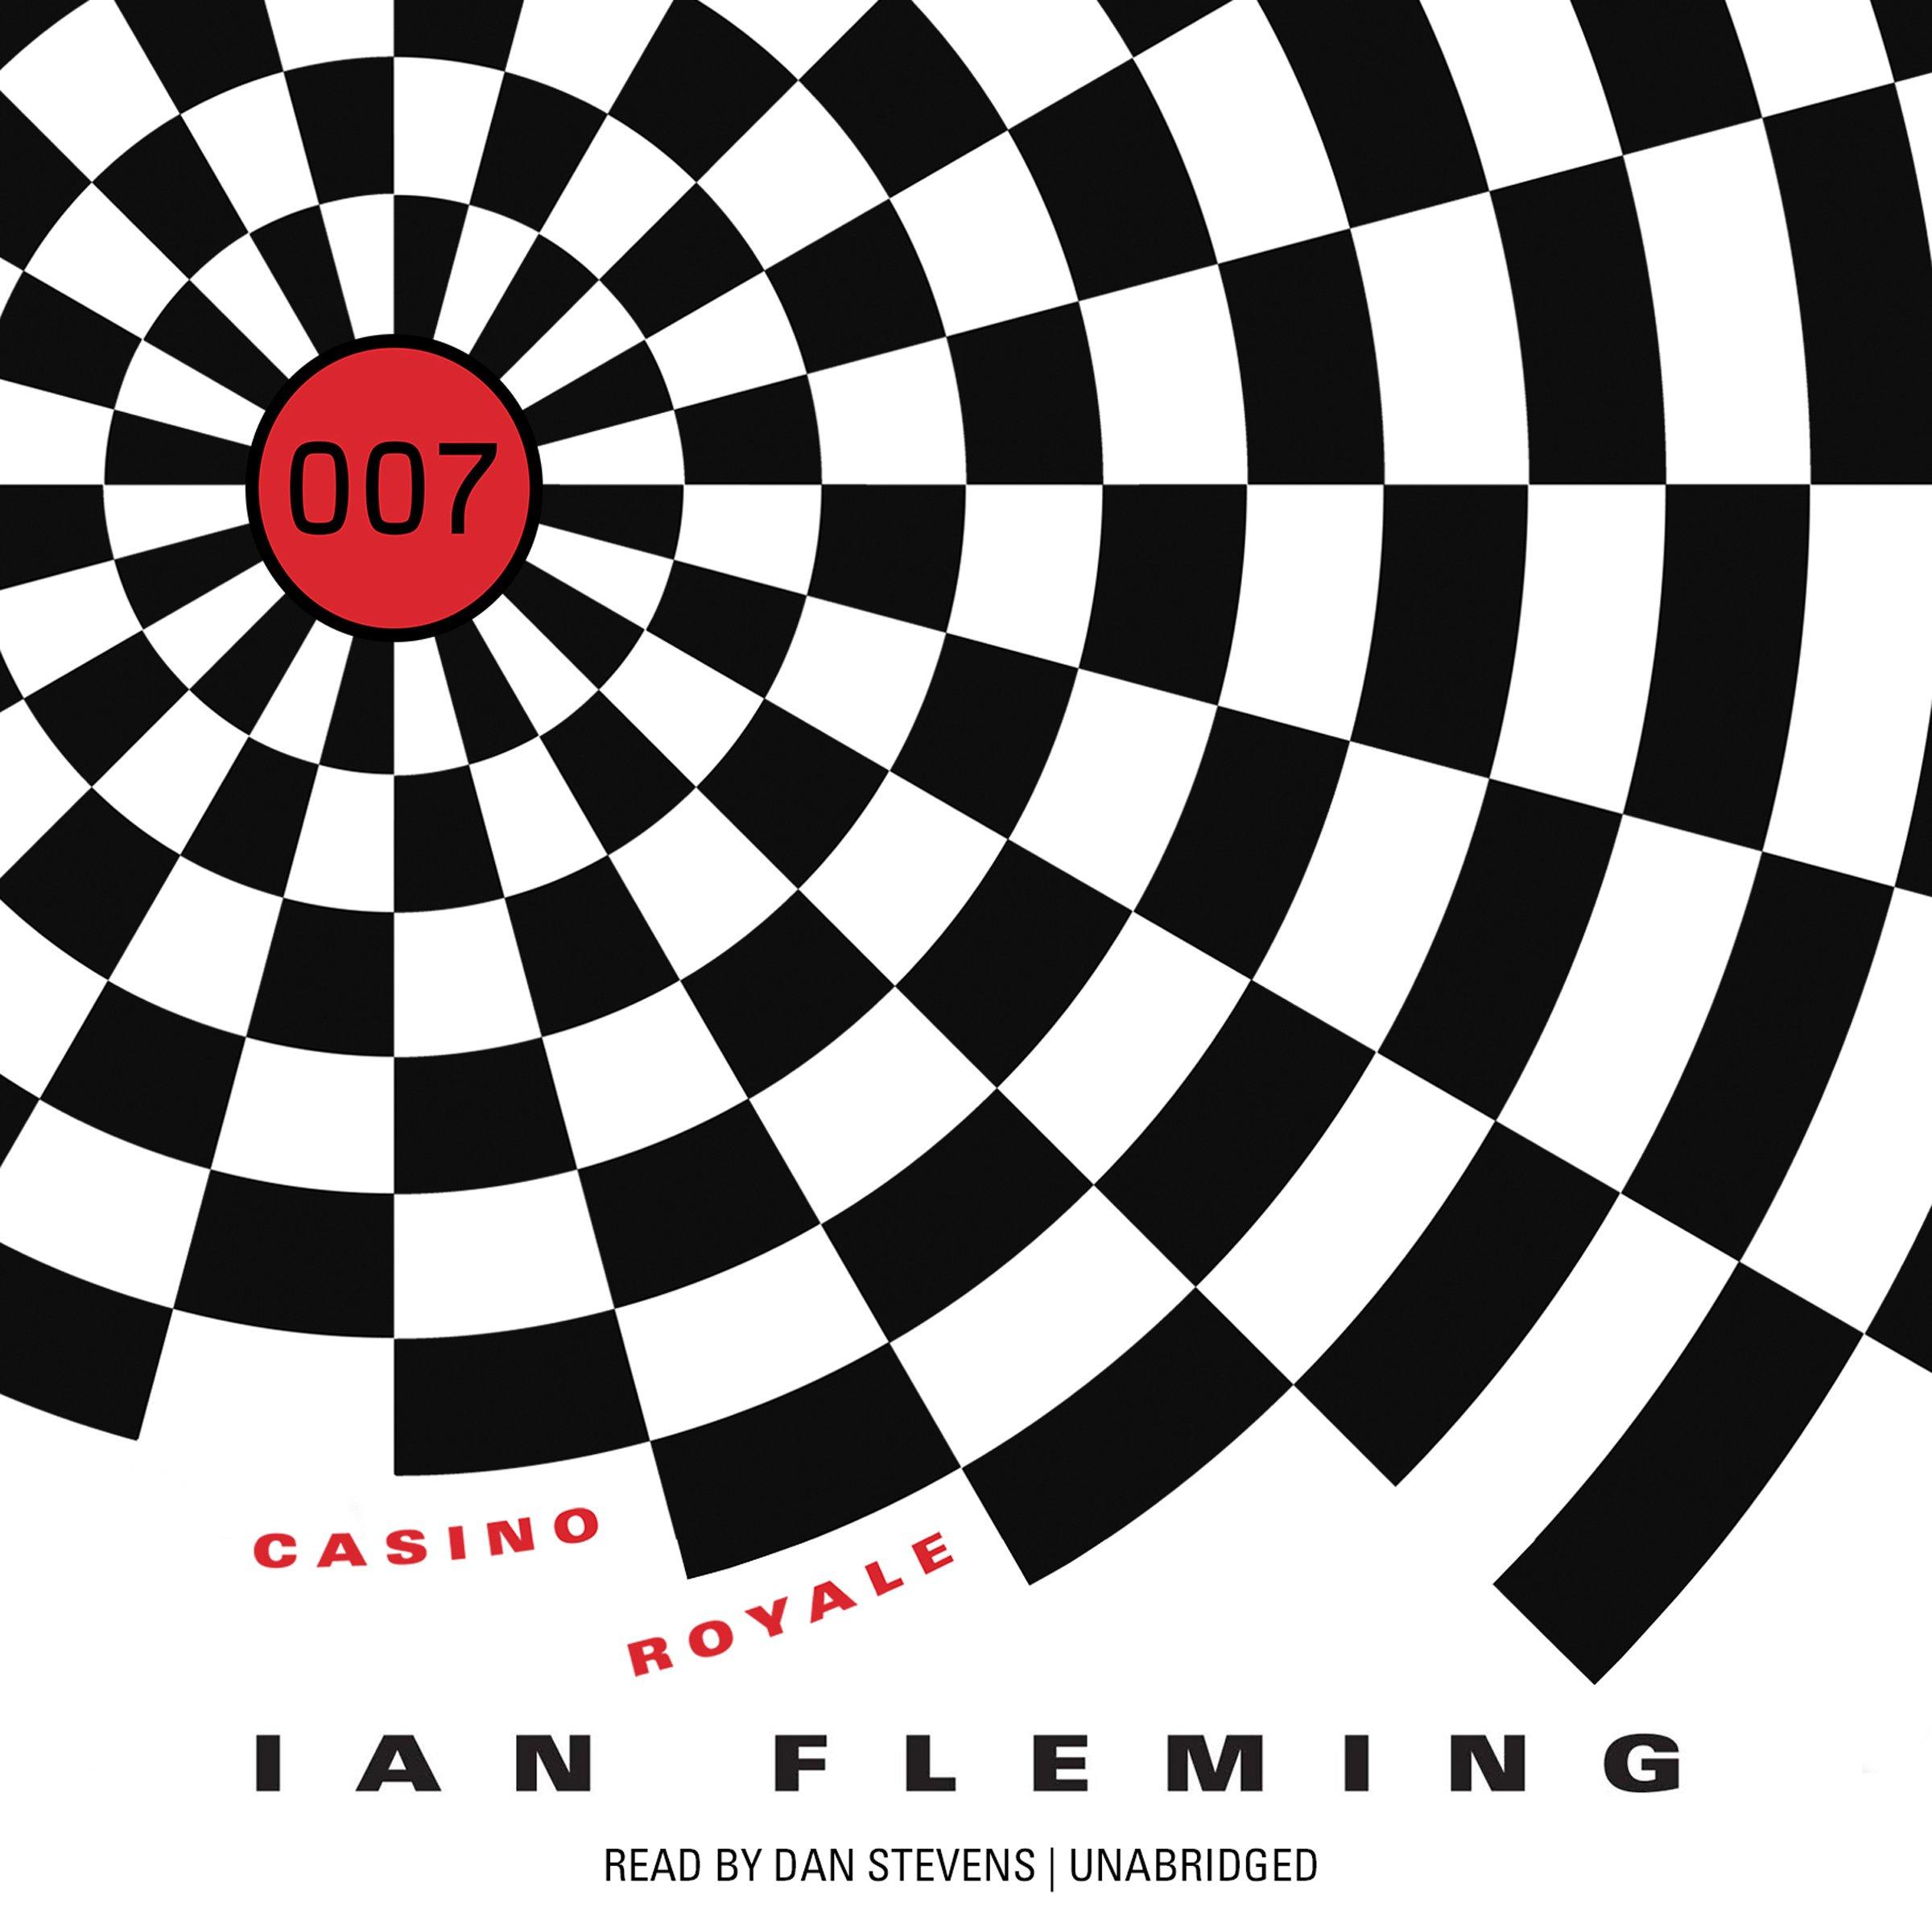 Casino Royale (James Bond series, Book 1) (007) pdf